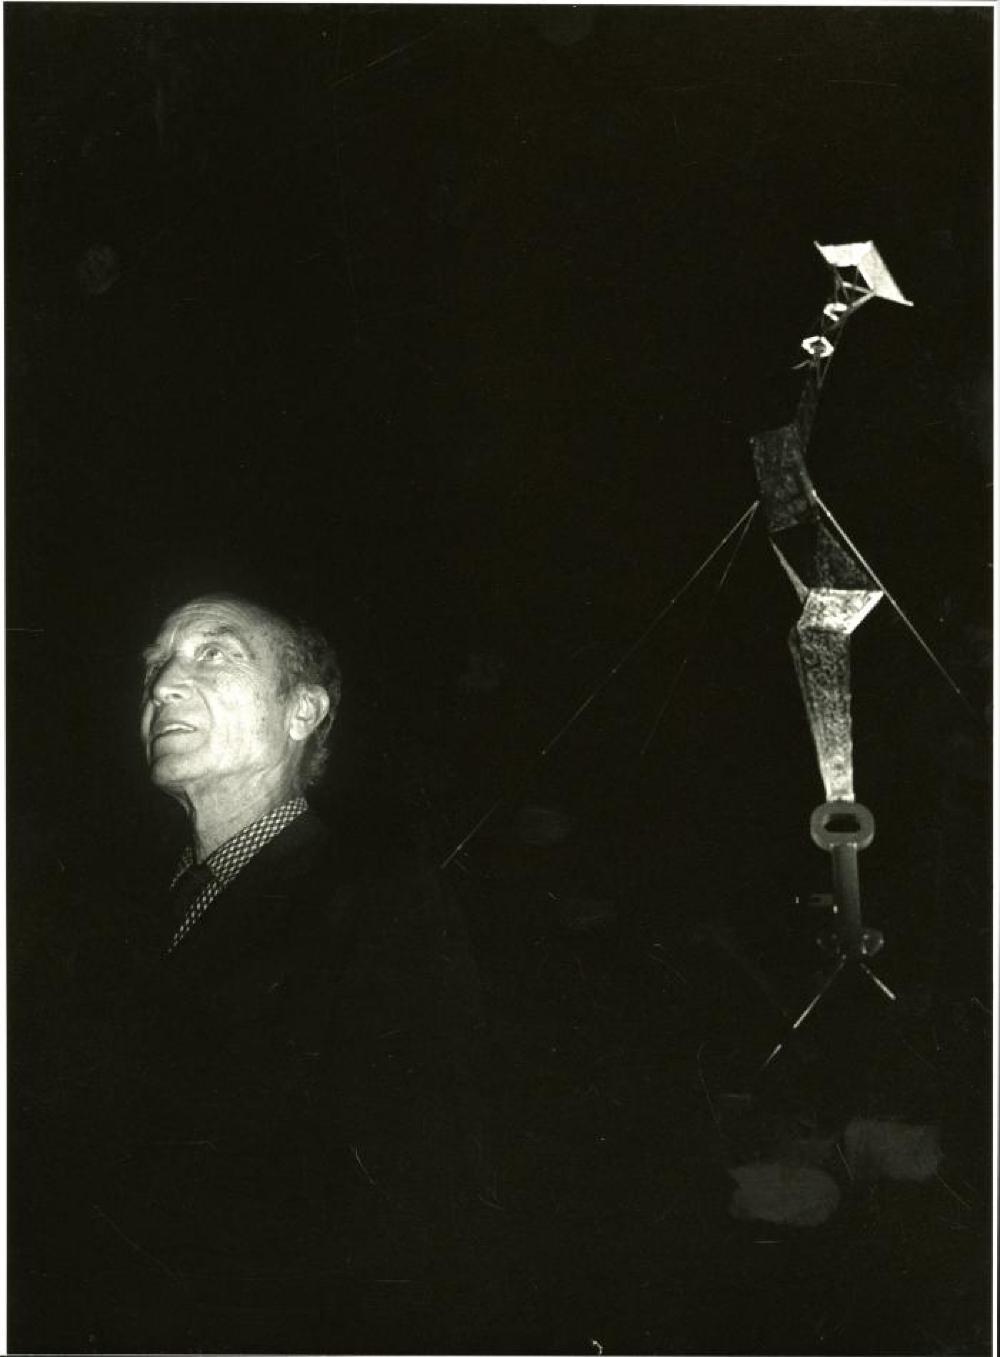 Isamu Noguchi with Bolt of Lightening/Memorial to Ben Franklin